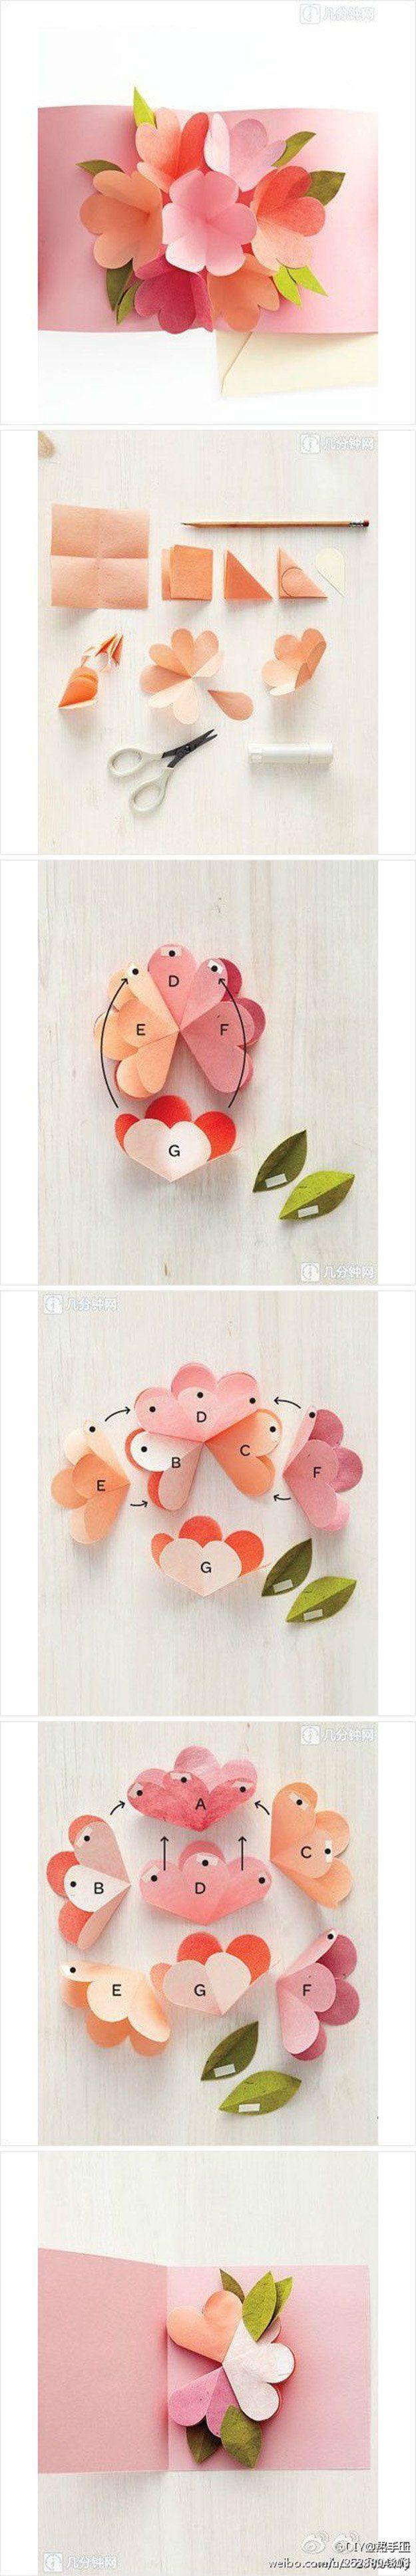 homemade motherus day cards textile ideas pinterest